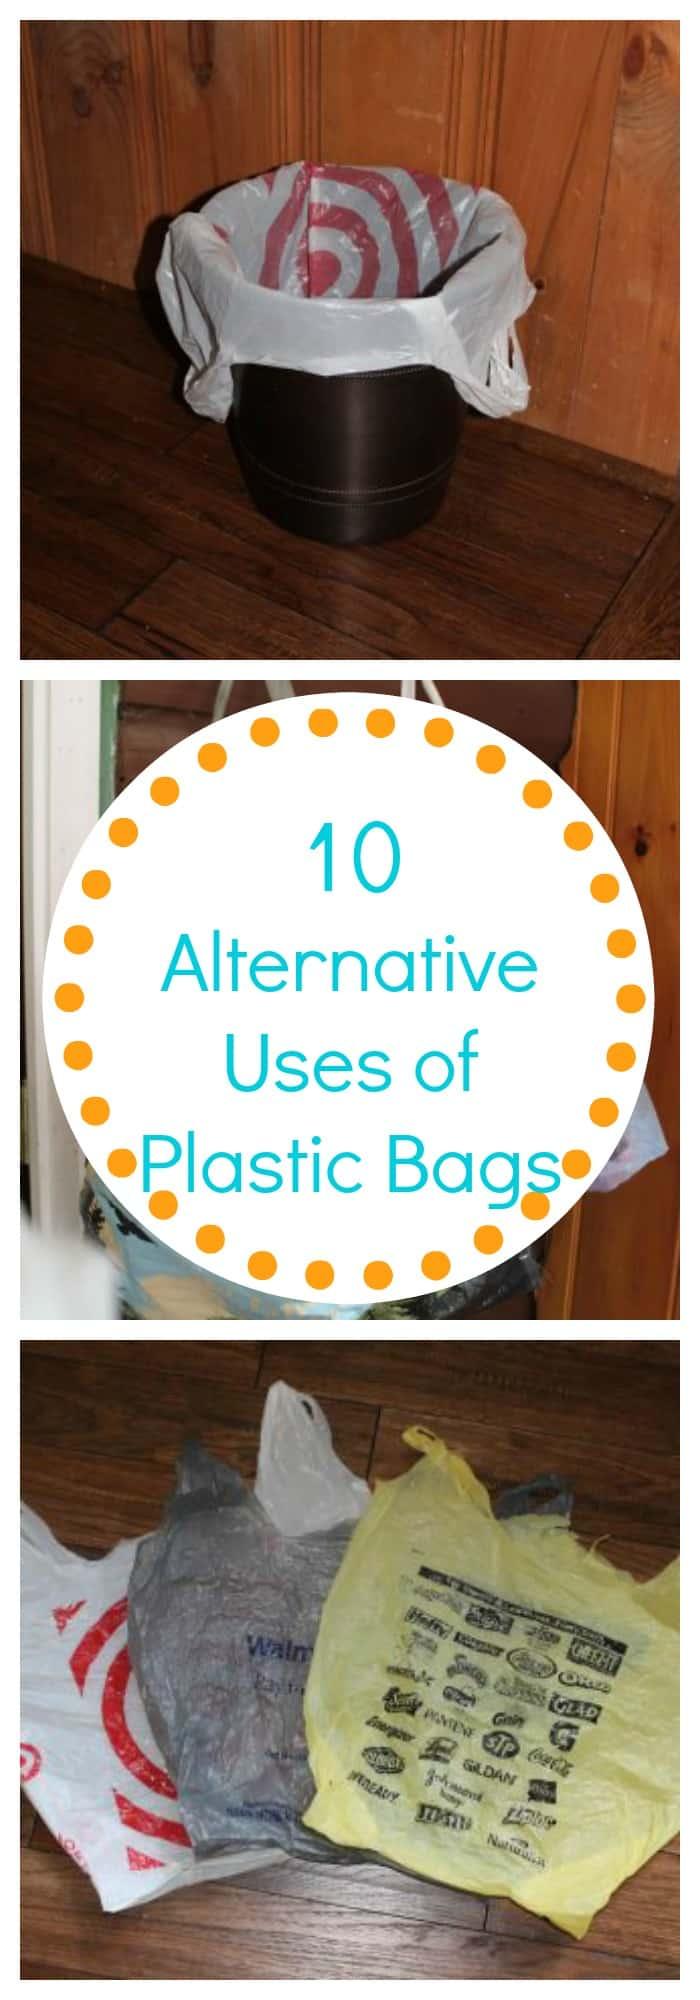 10 Alternative Uses of Plastic Bags